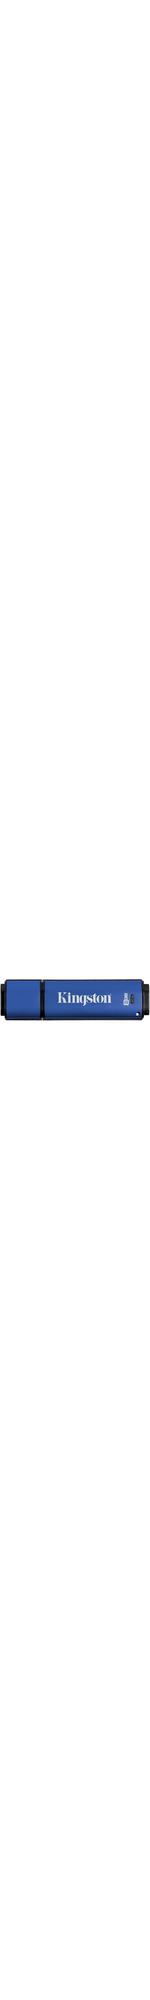 Kingston DataTraveler Vault 8 GB USB 3.0 Flash Drive